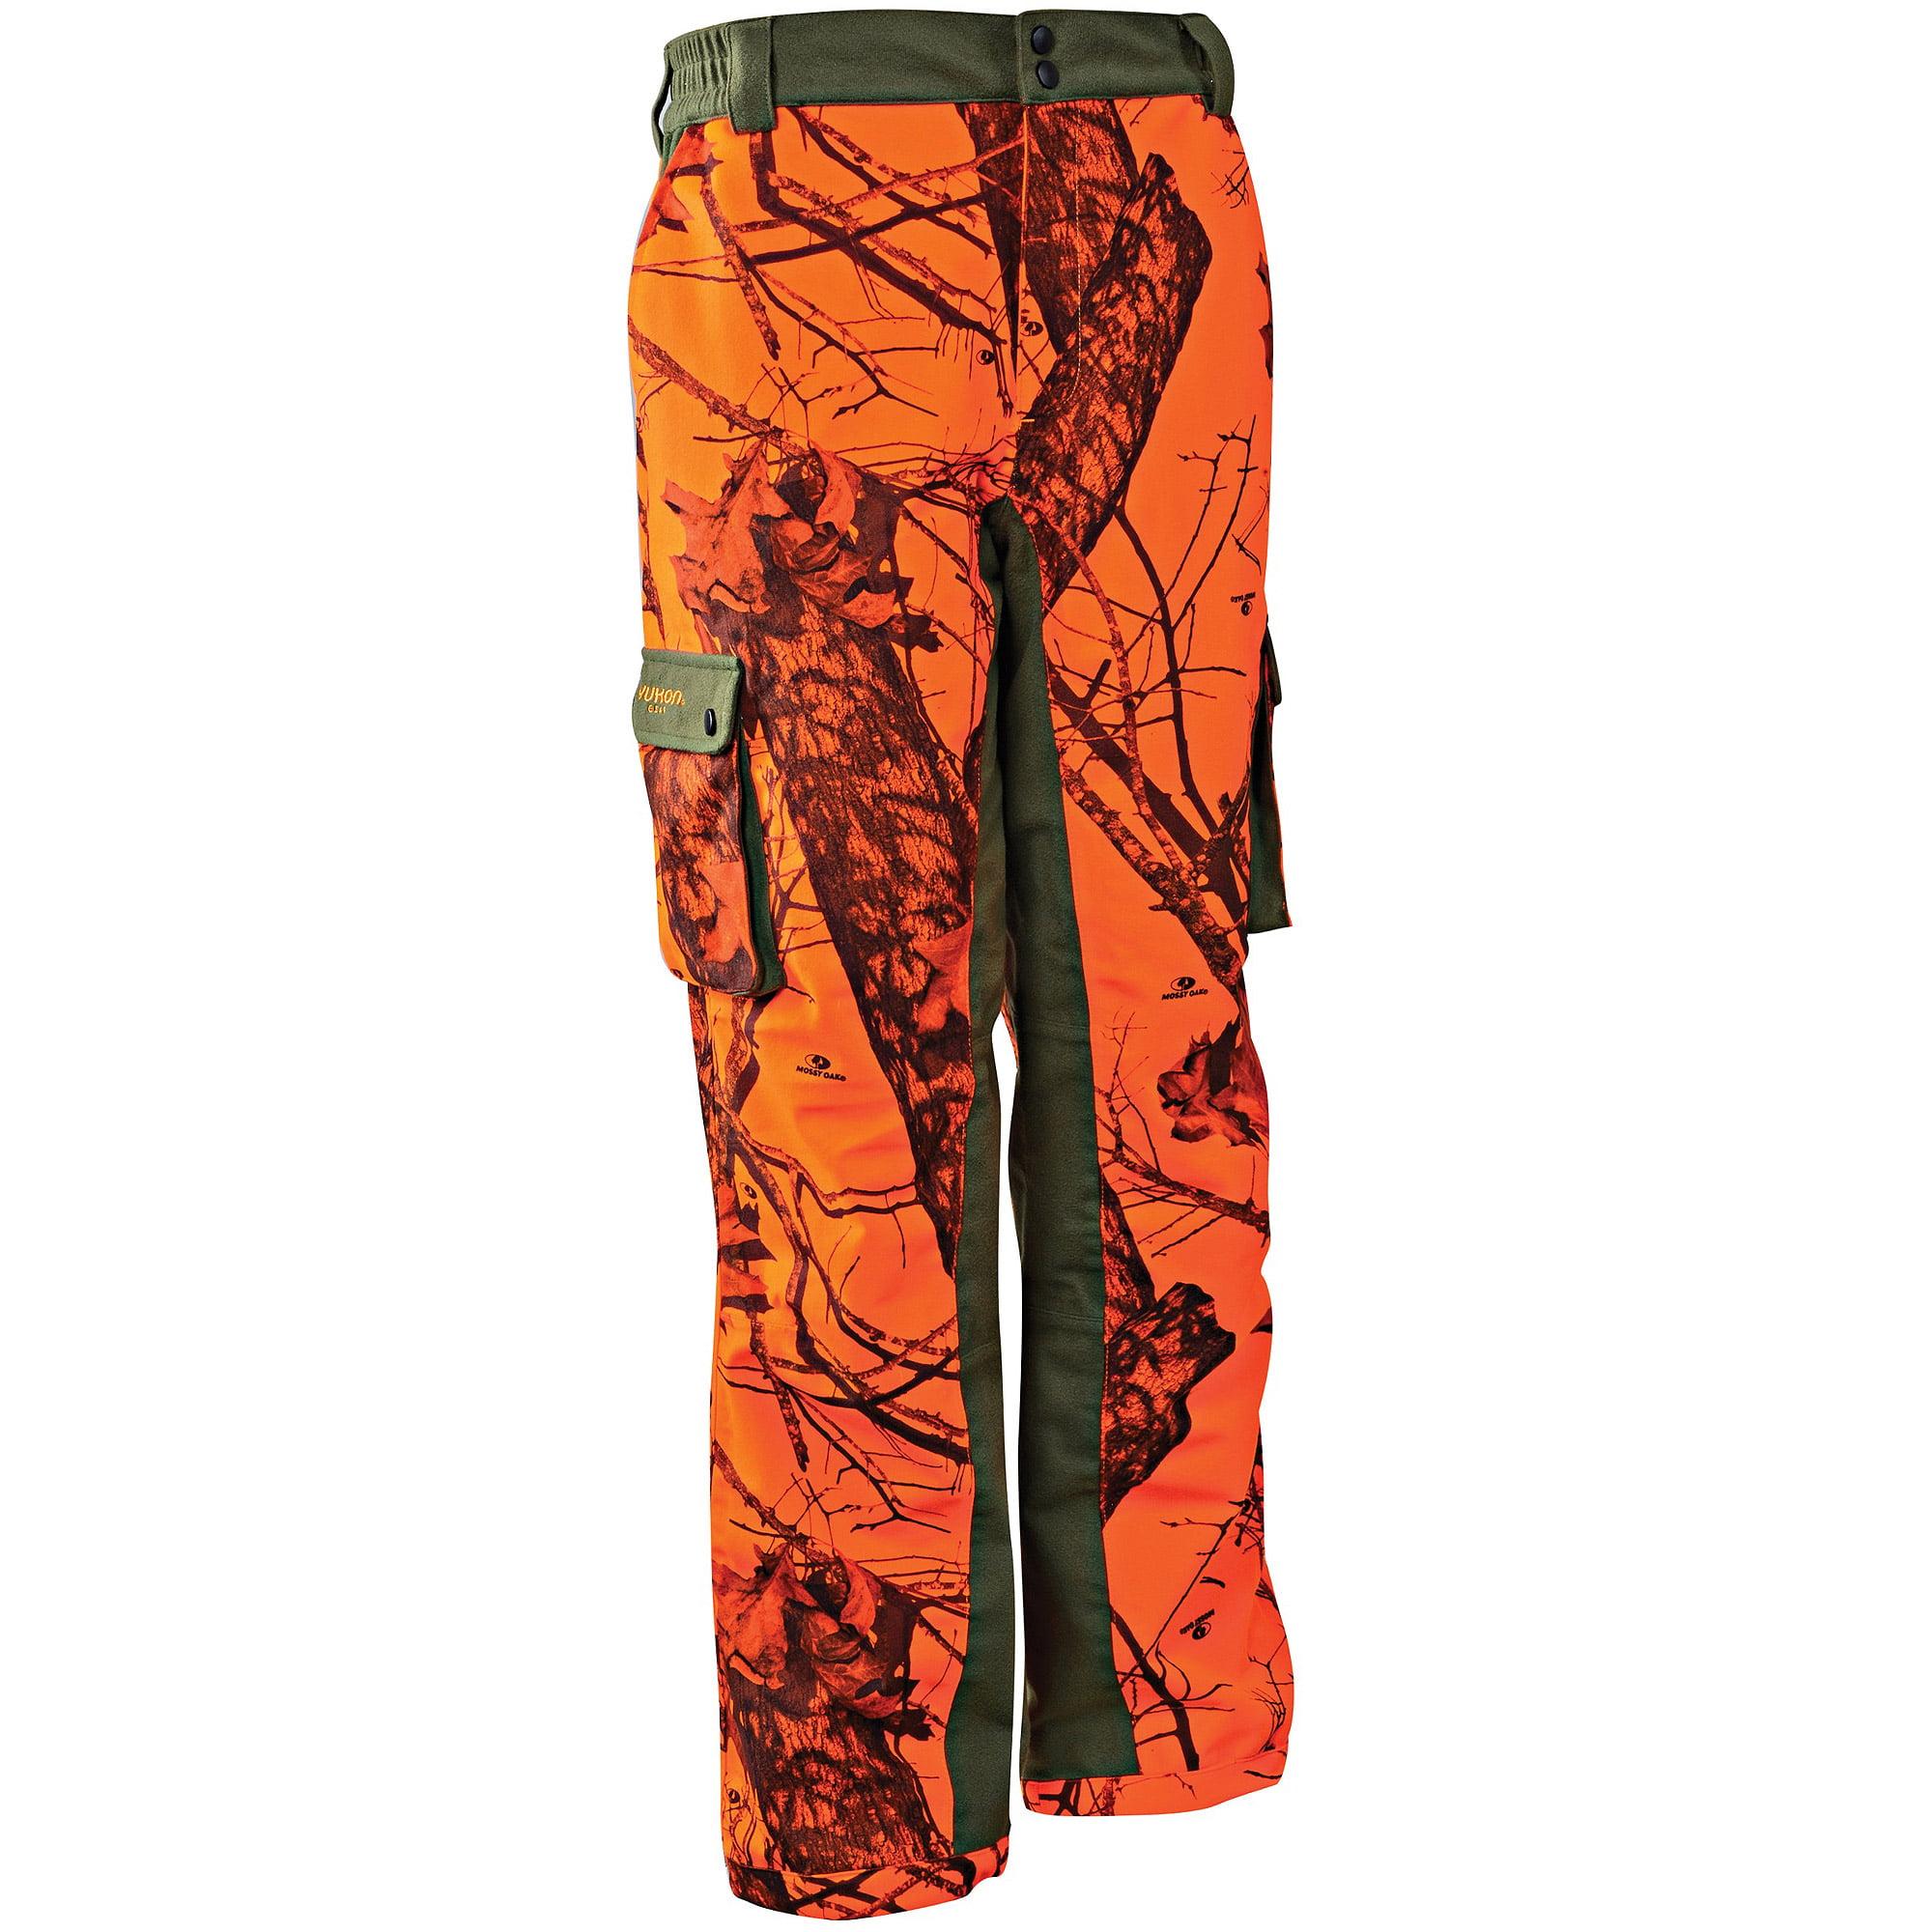 Yukon Gear Men's Scent Factor Pants, Break Up Blaze/Forest Green Accents